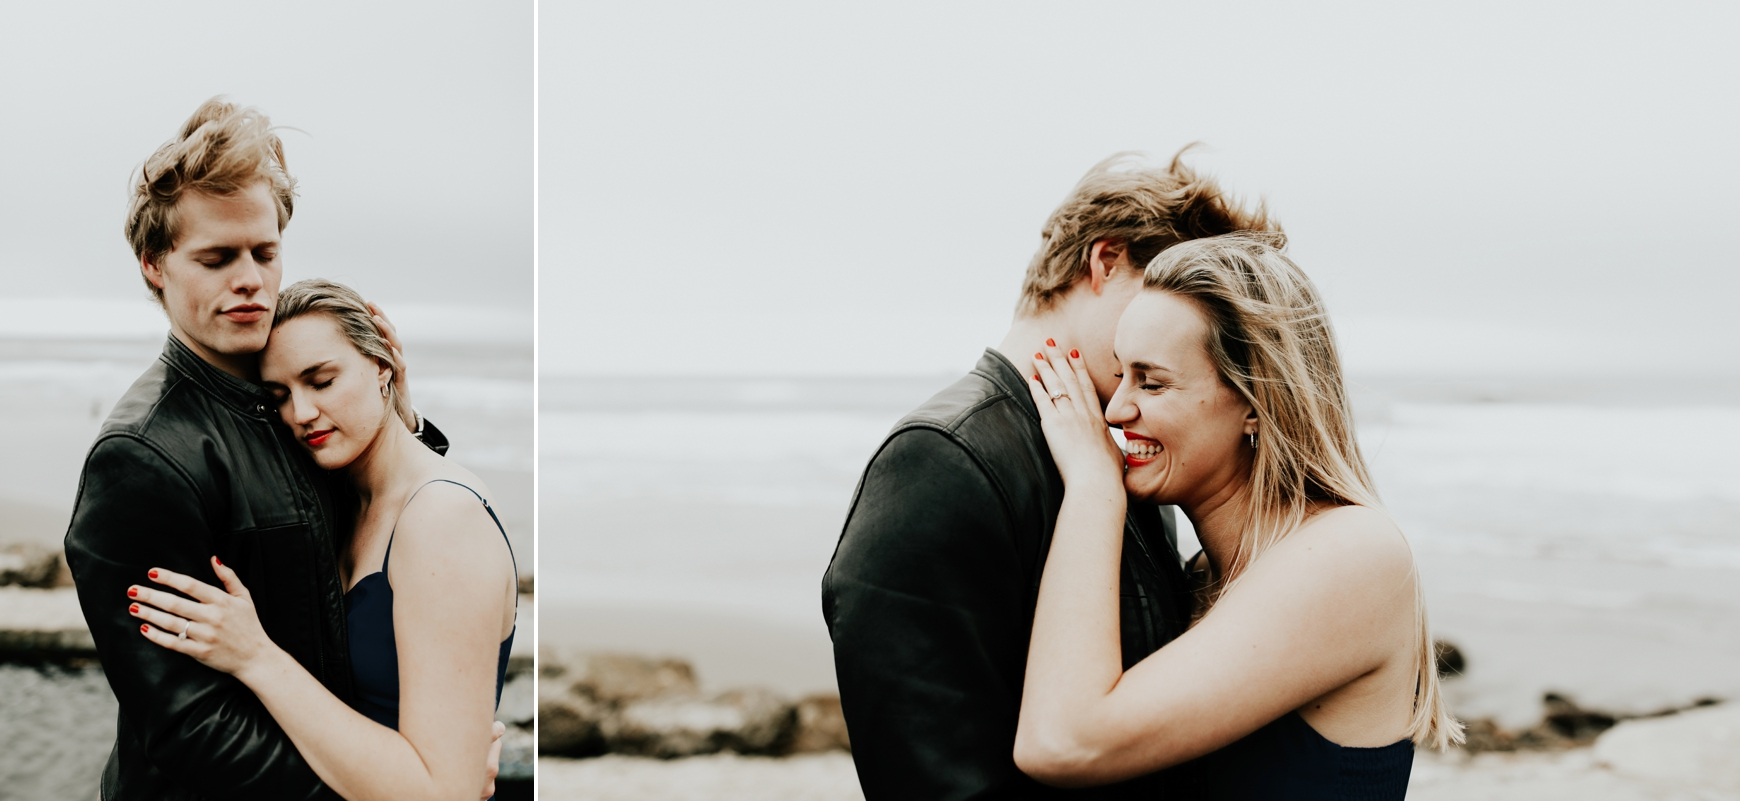 Sutro Baths Engagement Jessica & Ian Emily Magers Photography-63Emily Magers Photography.jpg